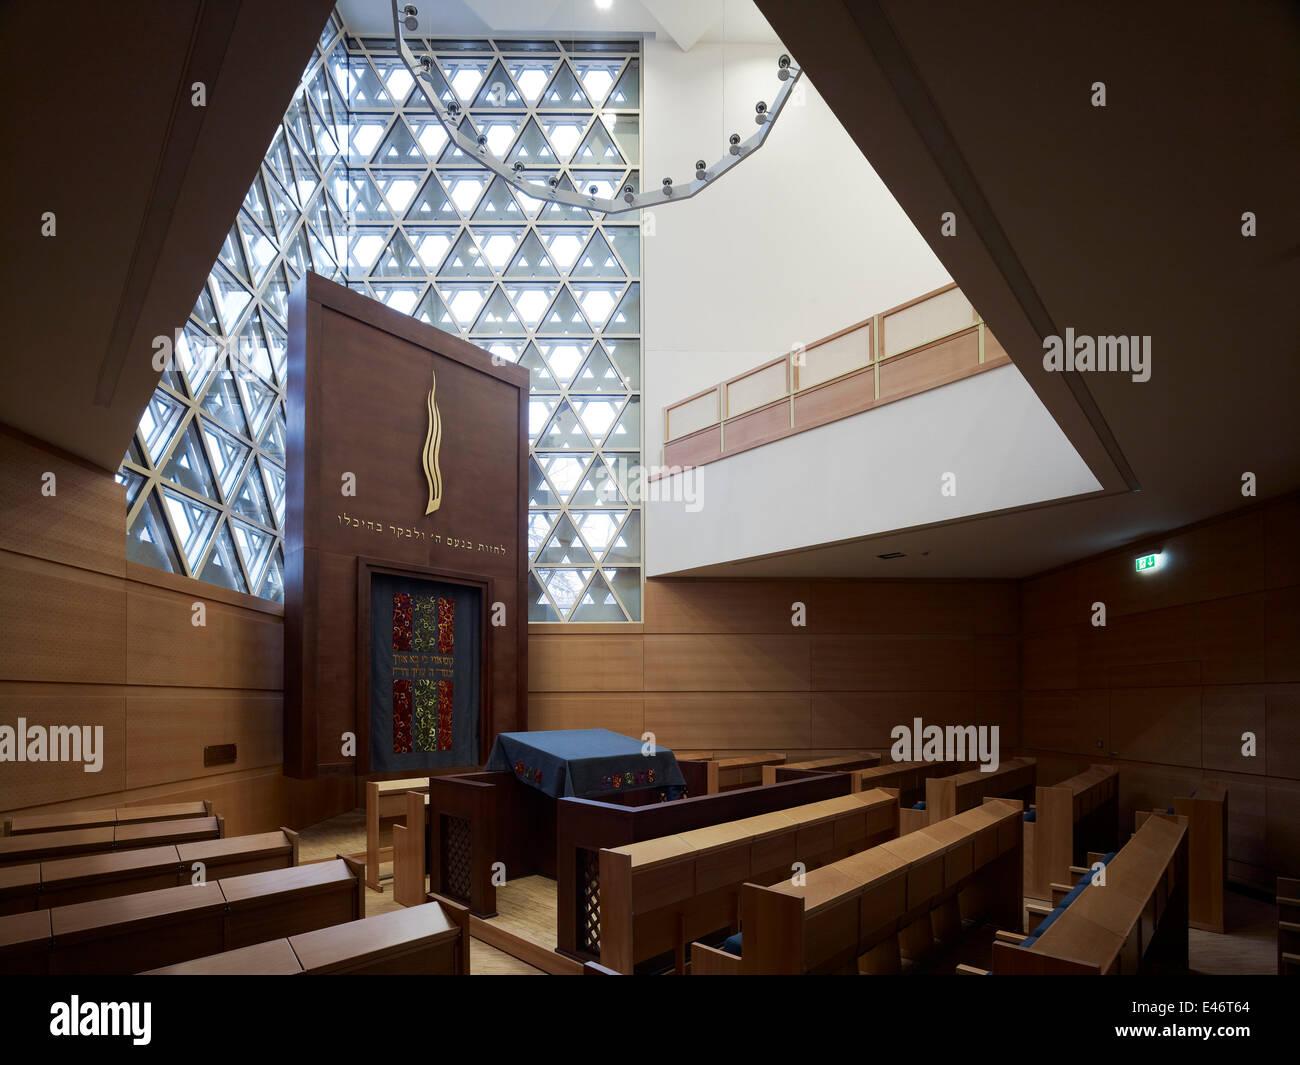 Synagoge am Weinhof, Ulm, Germany. Architect: kister scheithauer gross architects, 2012. - Stock Image